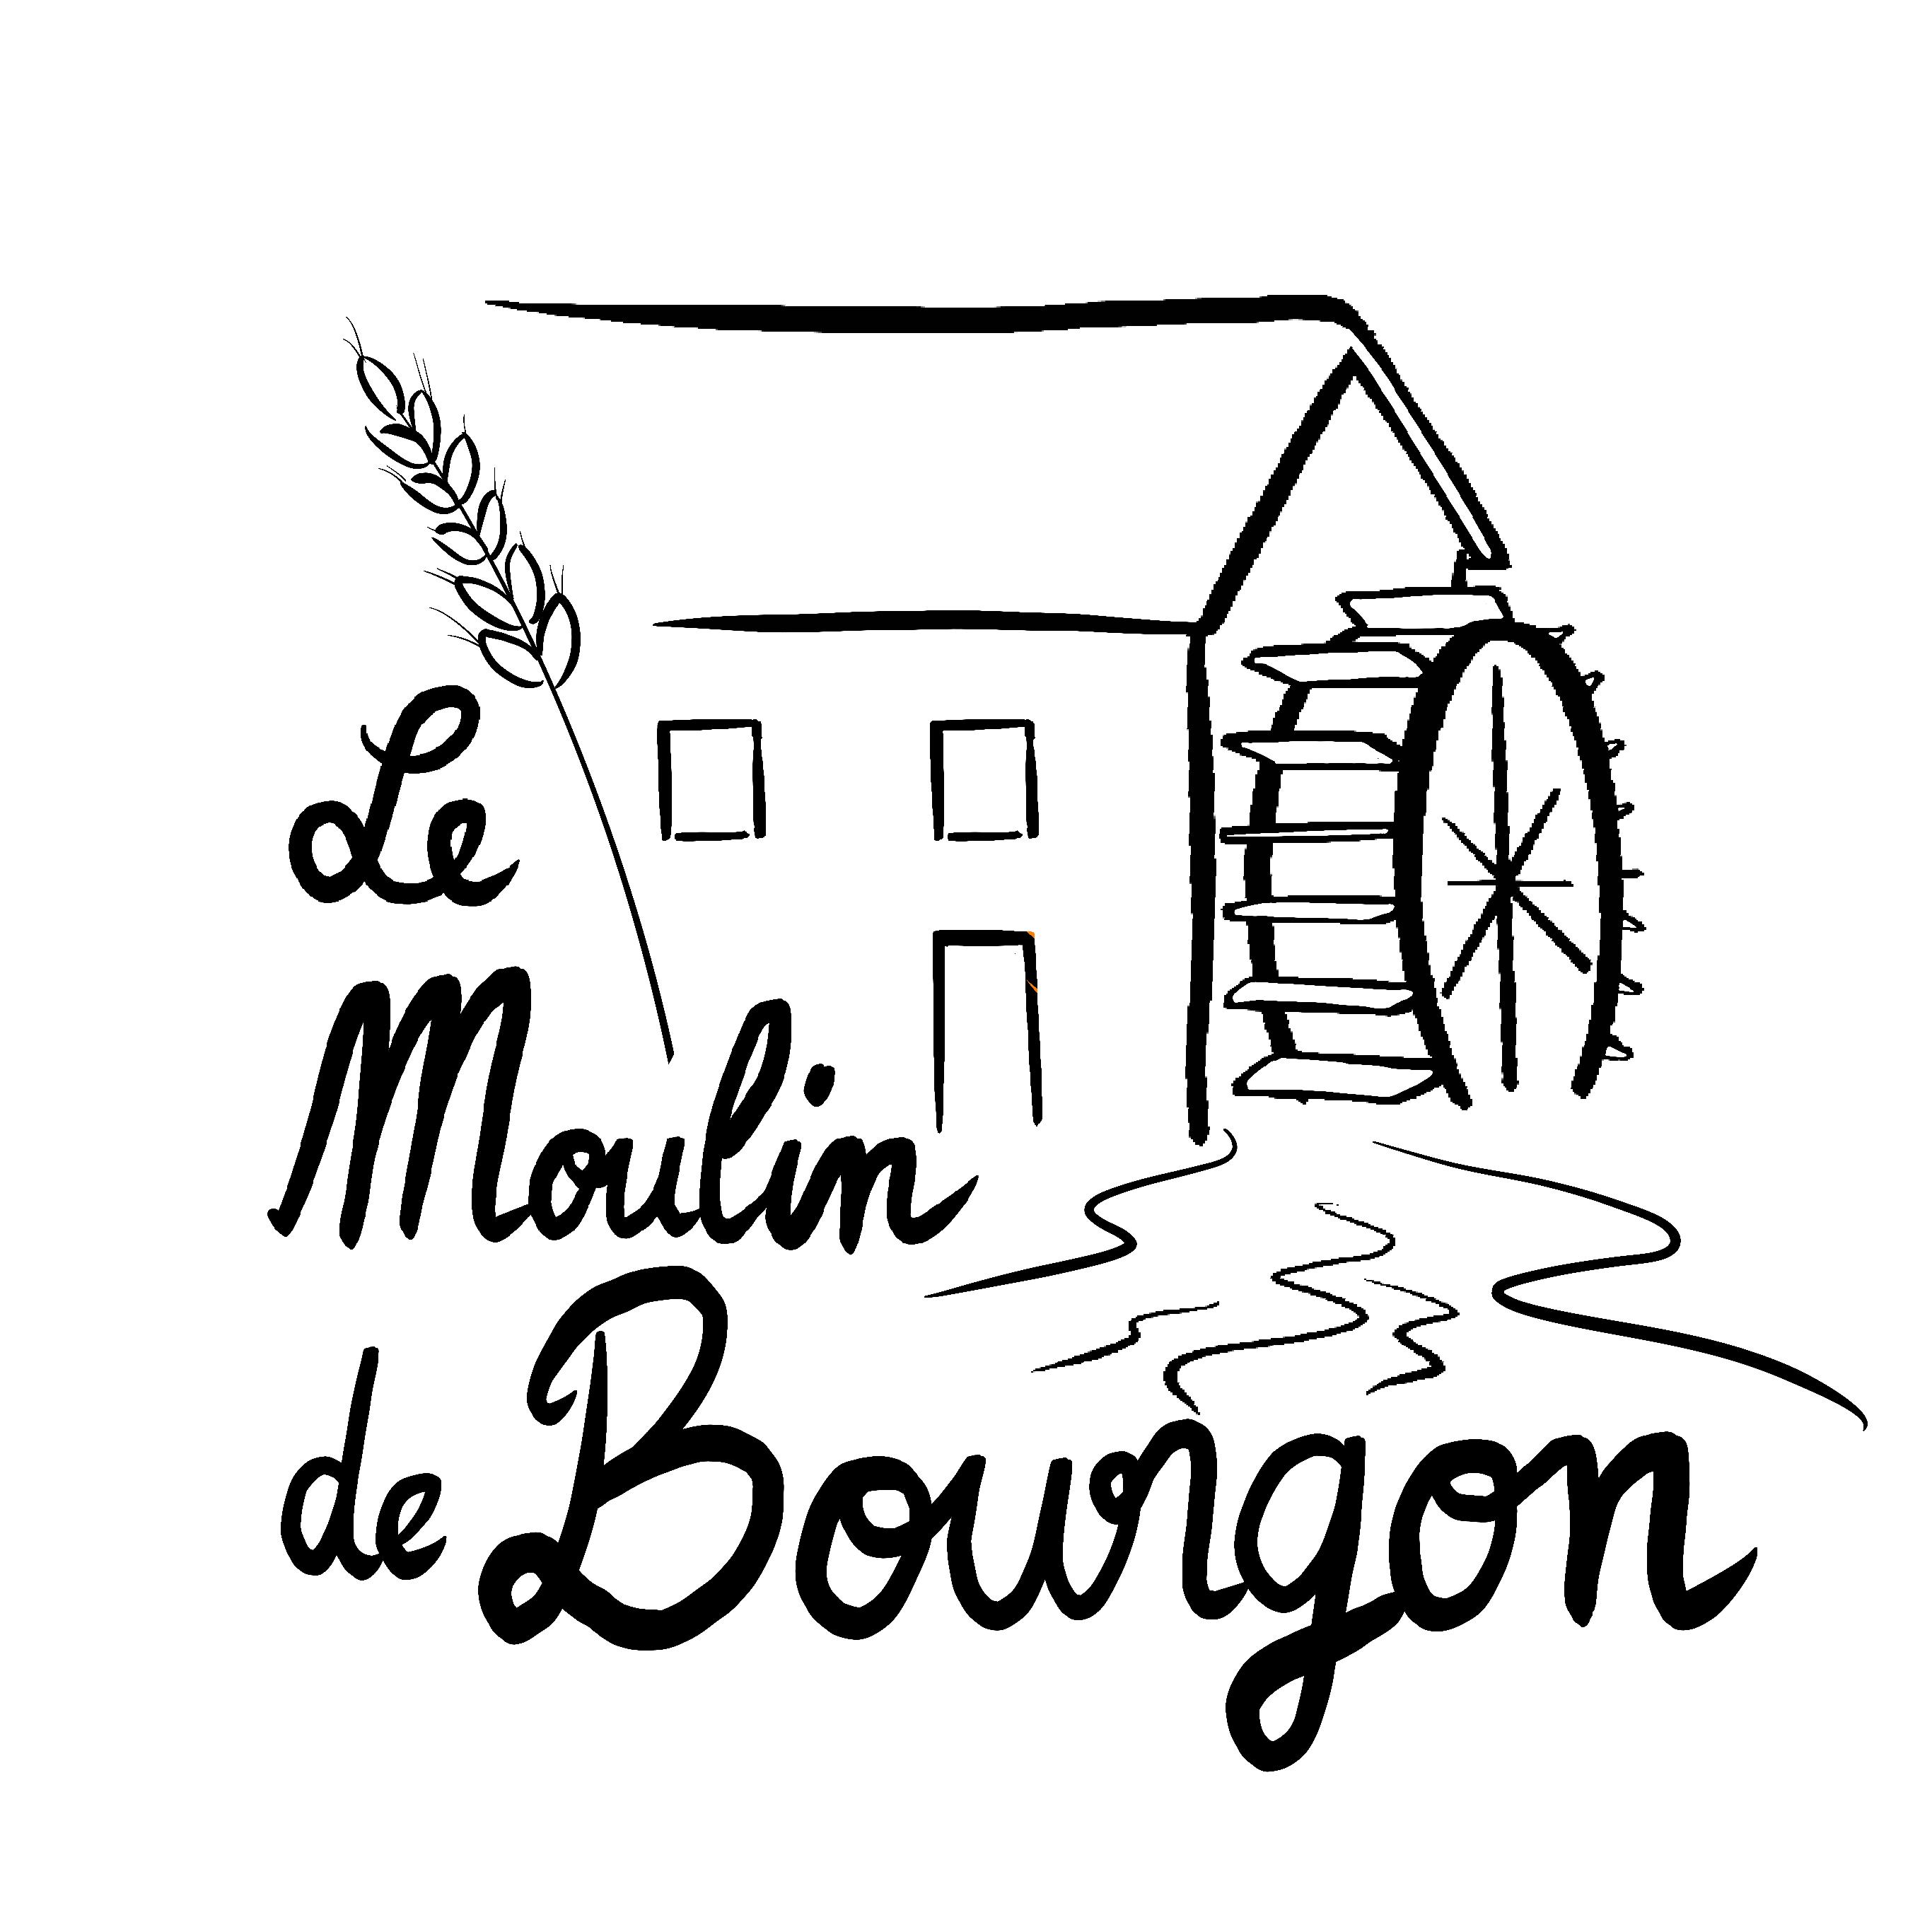 SARL Moulin de Bourgon - Producteur de Farine